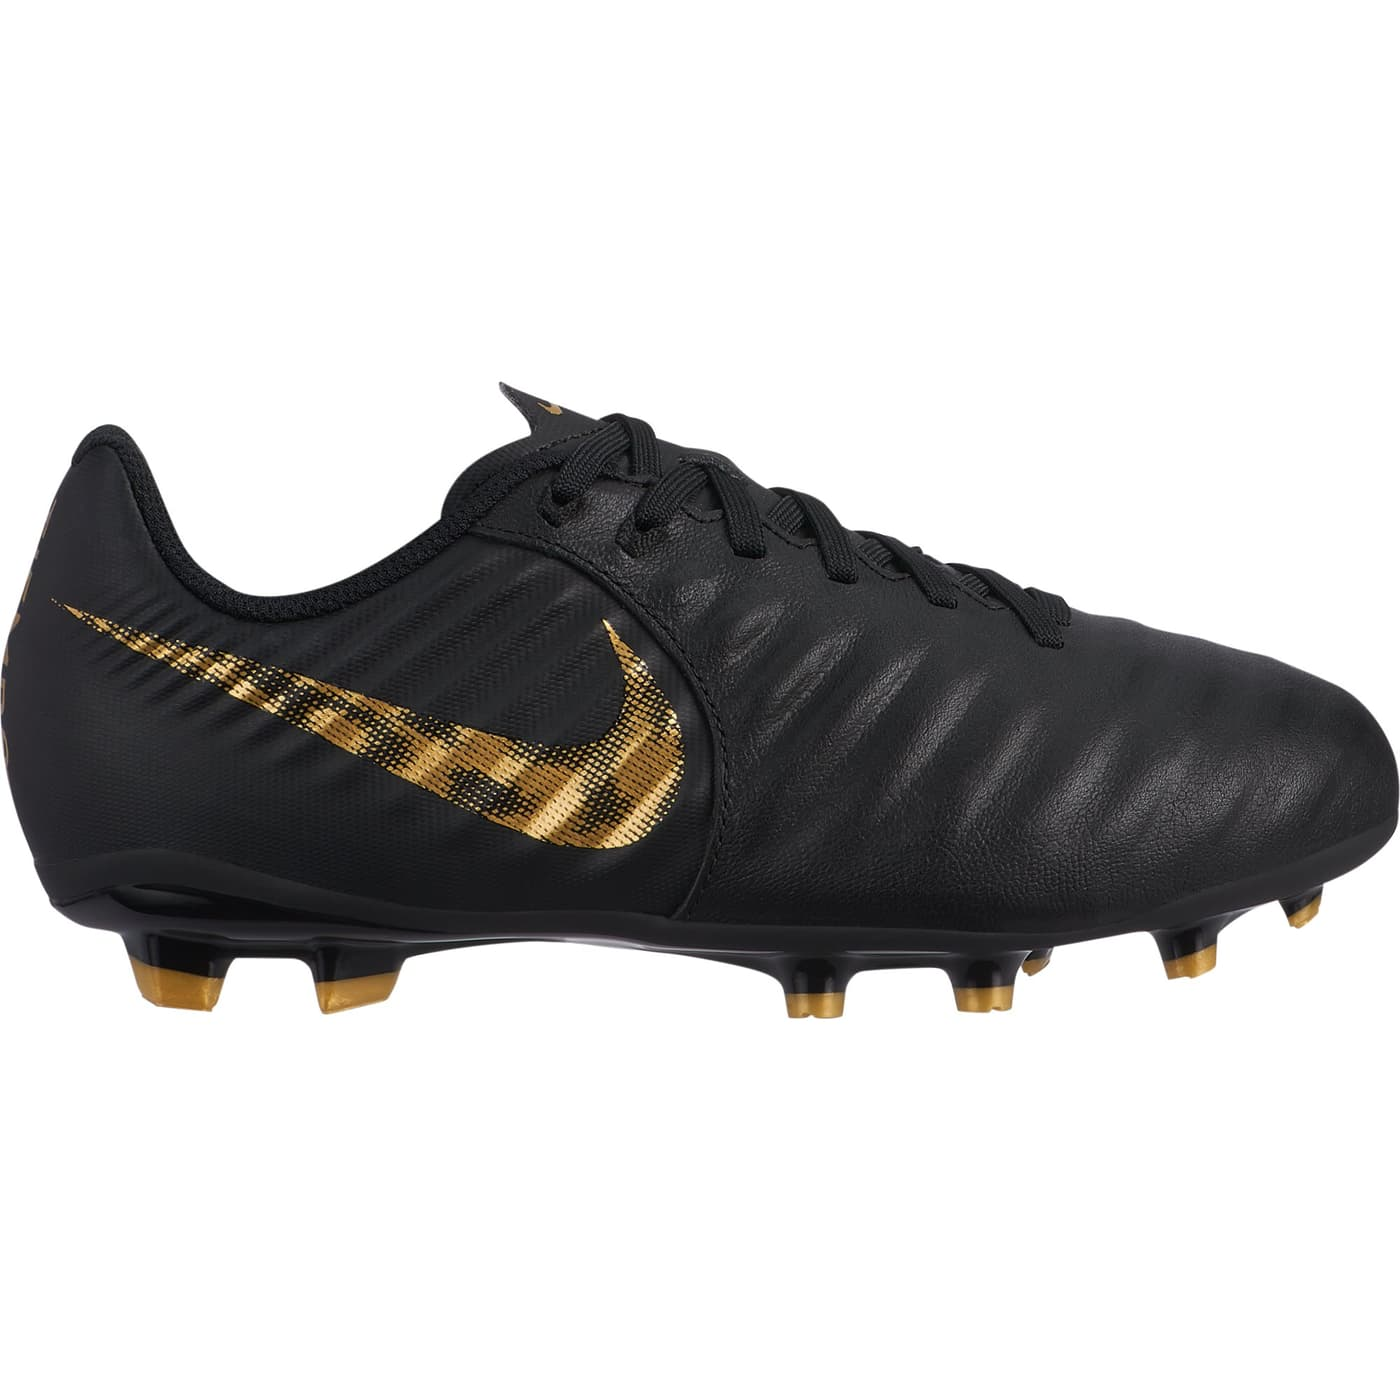 bas prix e0750 60f81 Nike Legend 7 Academy MG Chaussures de football pour enfant